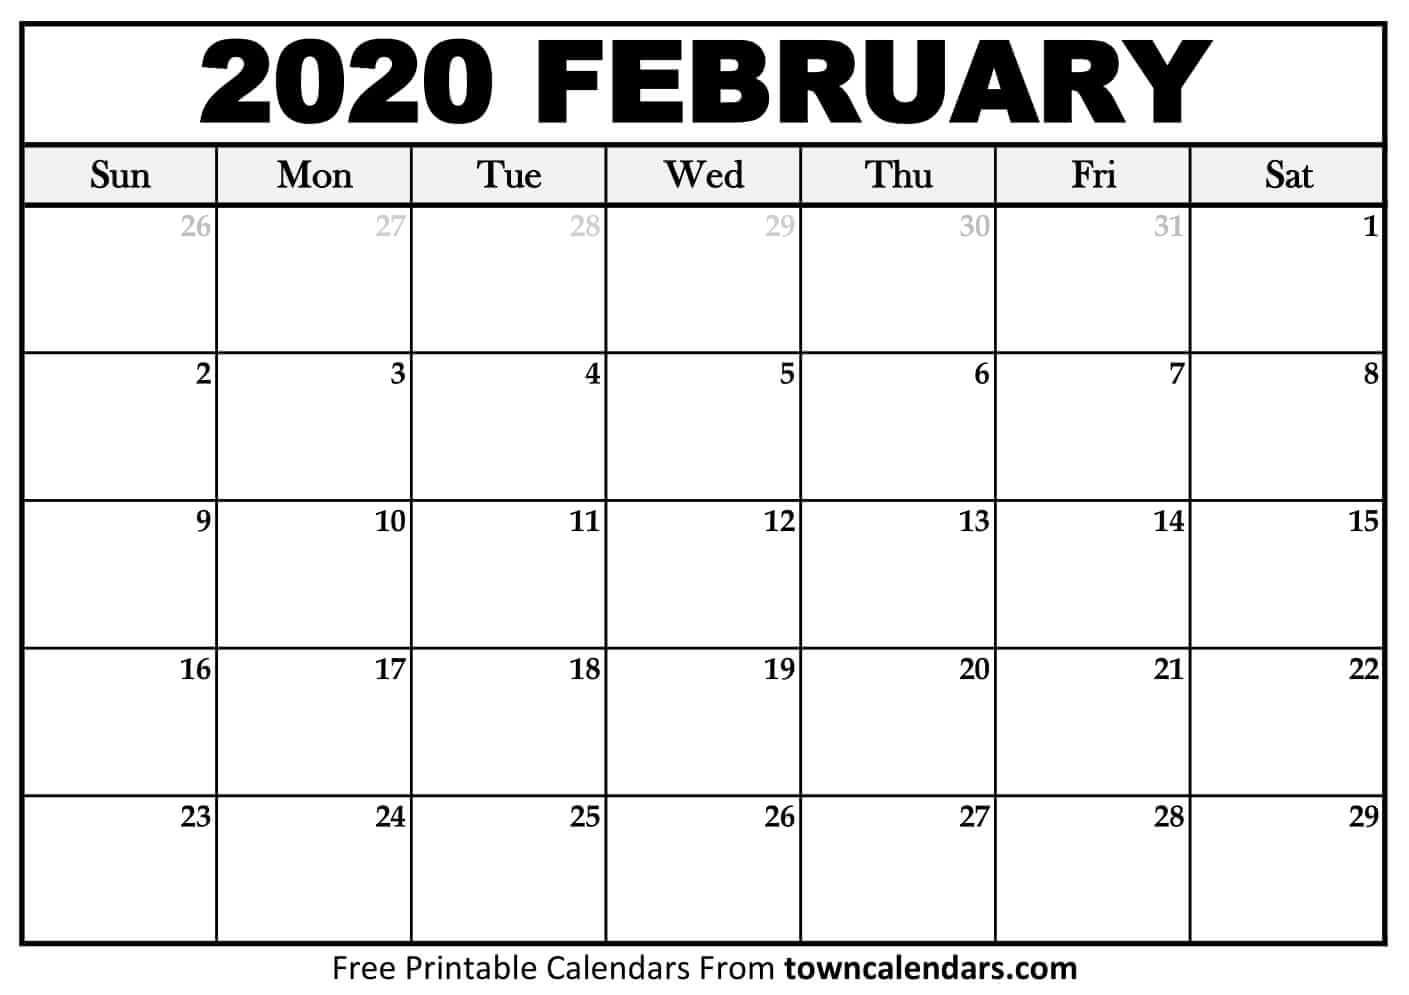 Printable February 2020 Calendar – Towncalendars – Printable